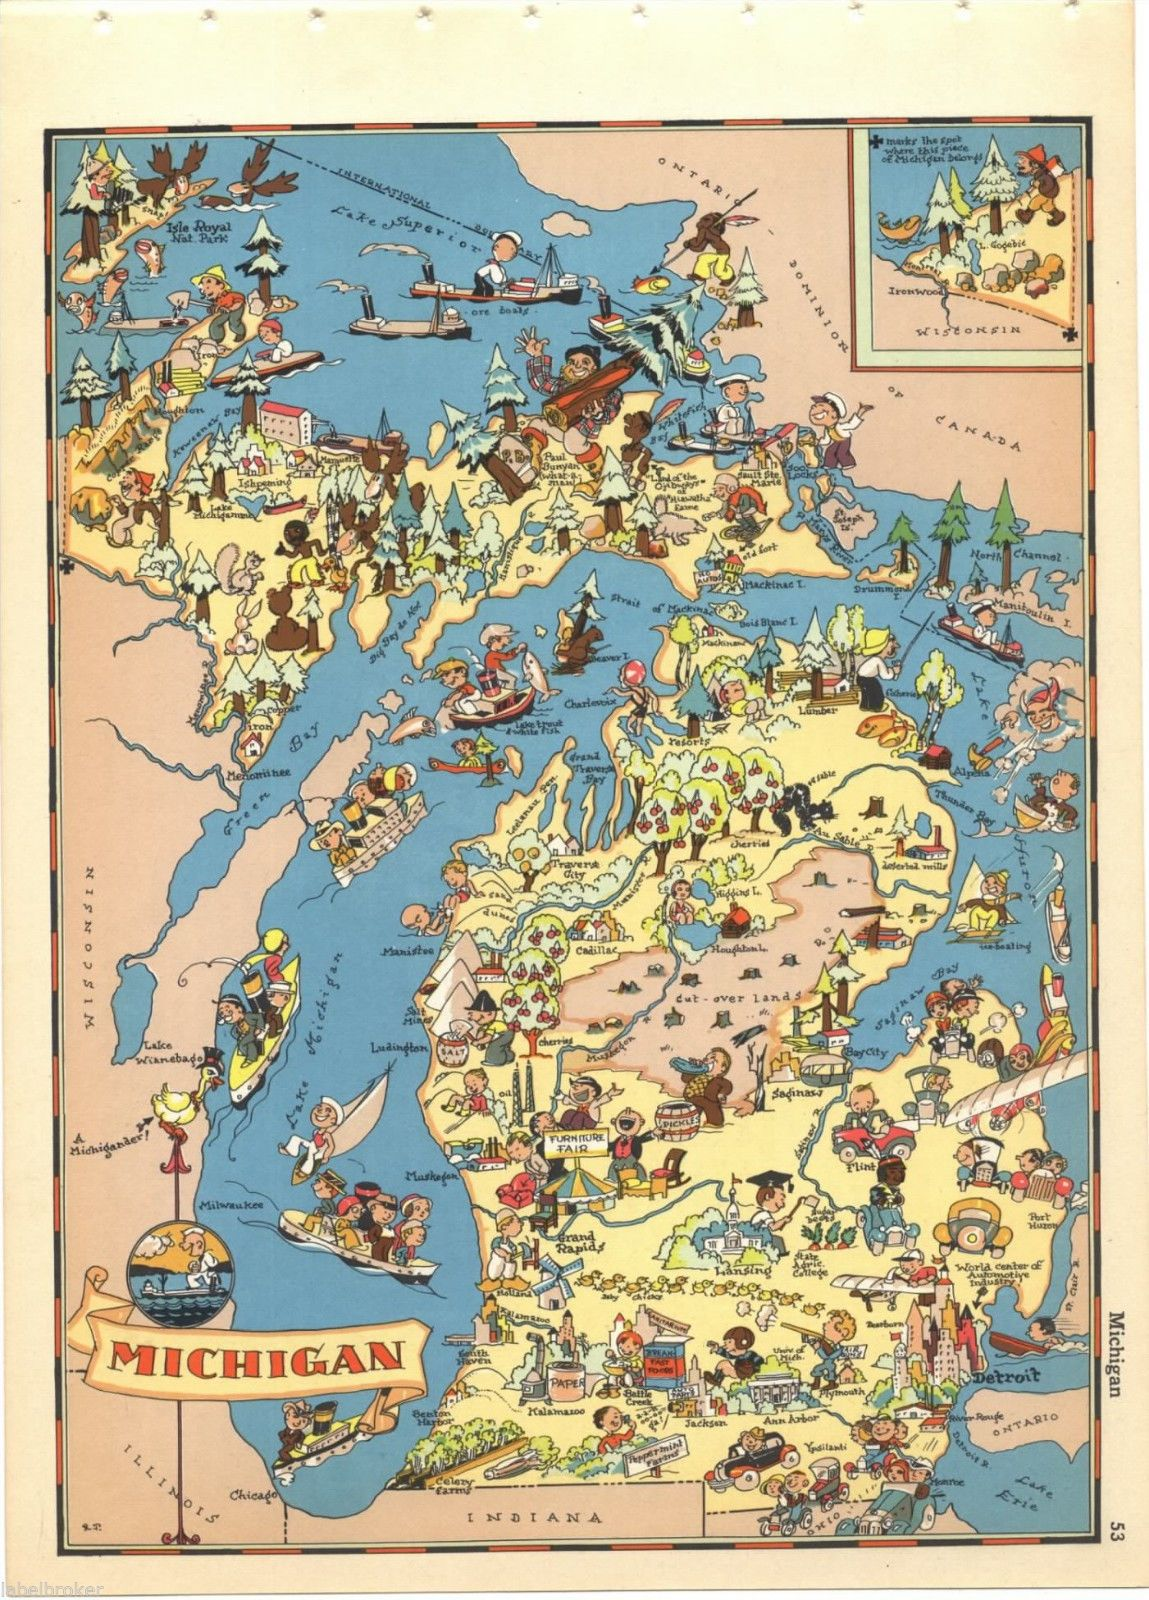 Ruth Taylor Vintage Michigan Map Original Cartoon RARE Pictorial